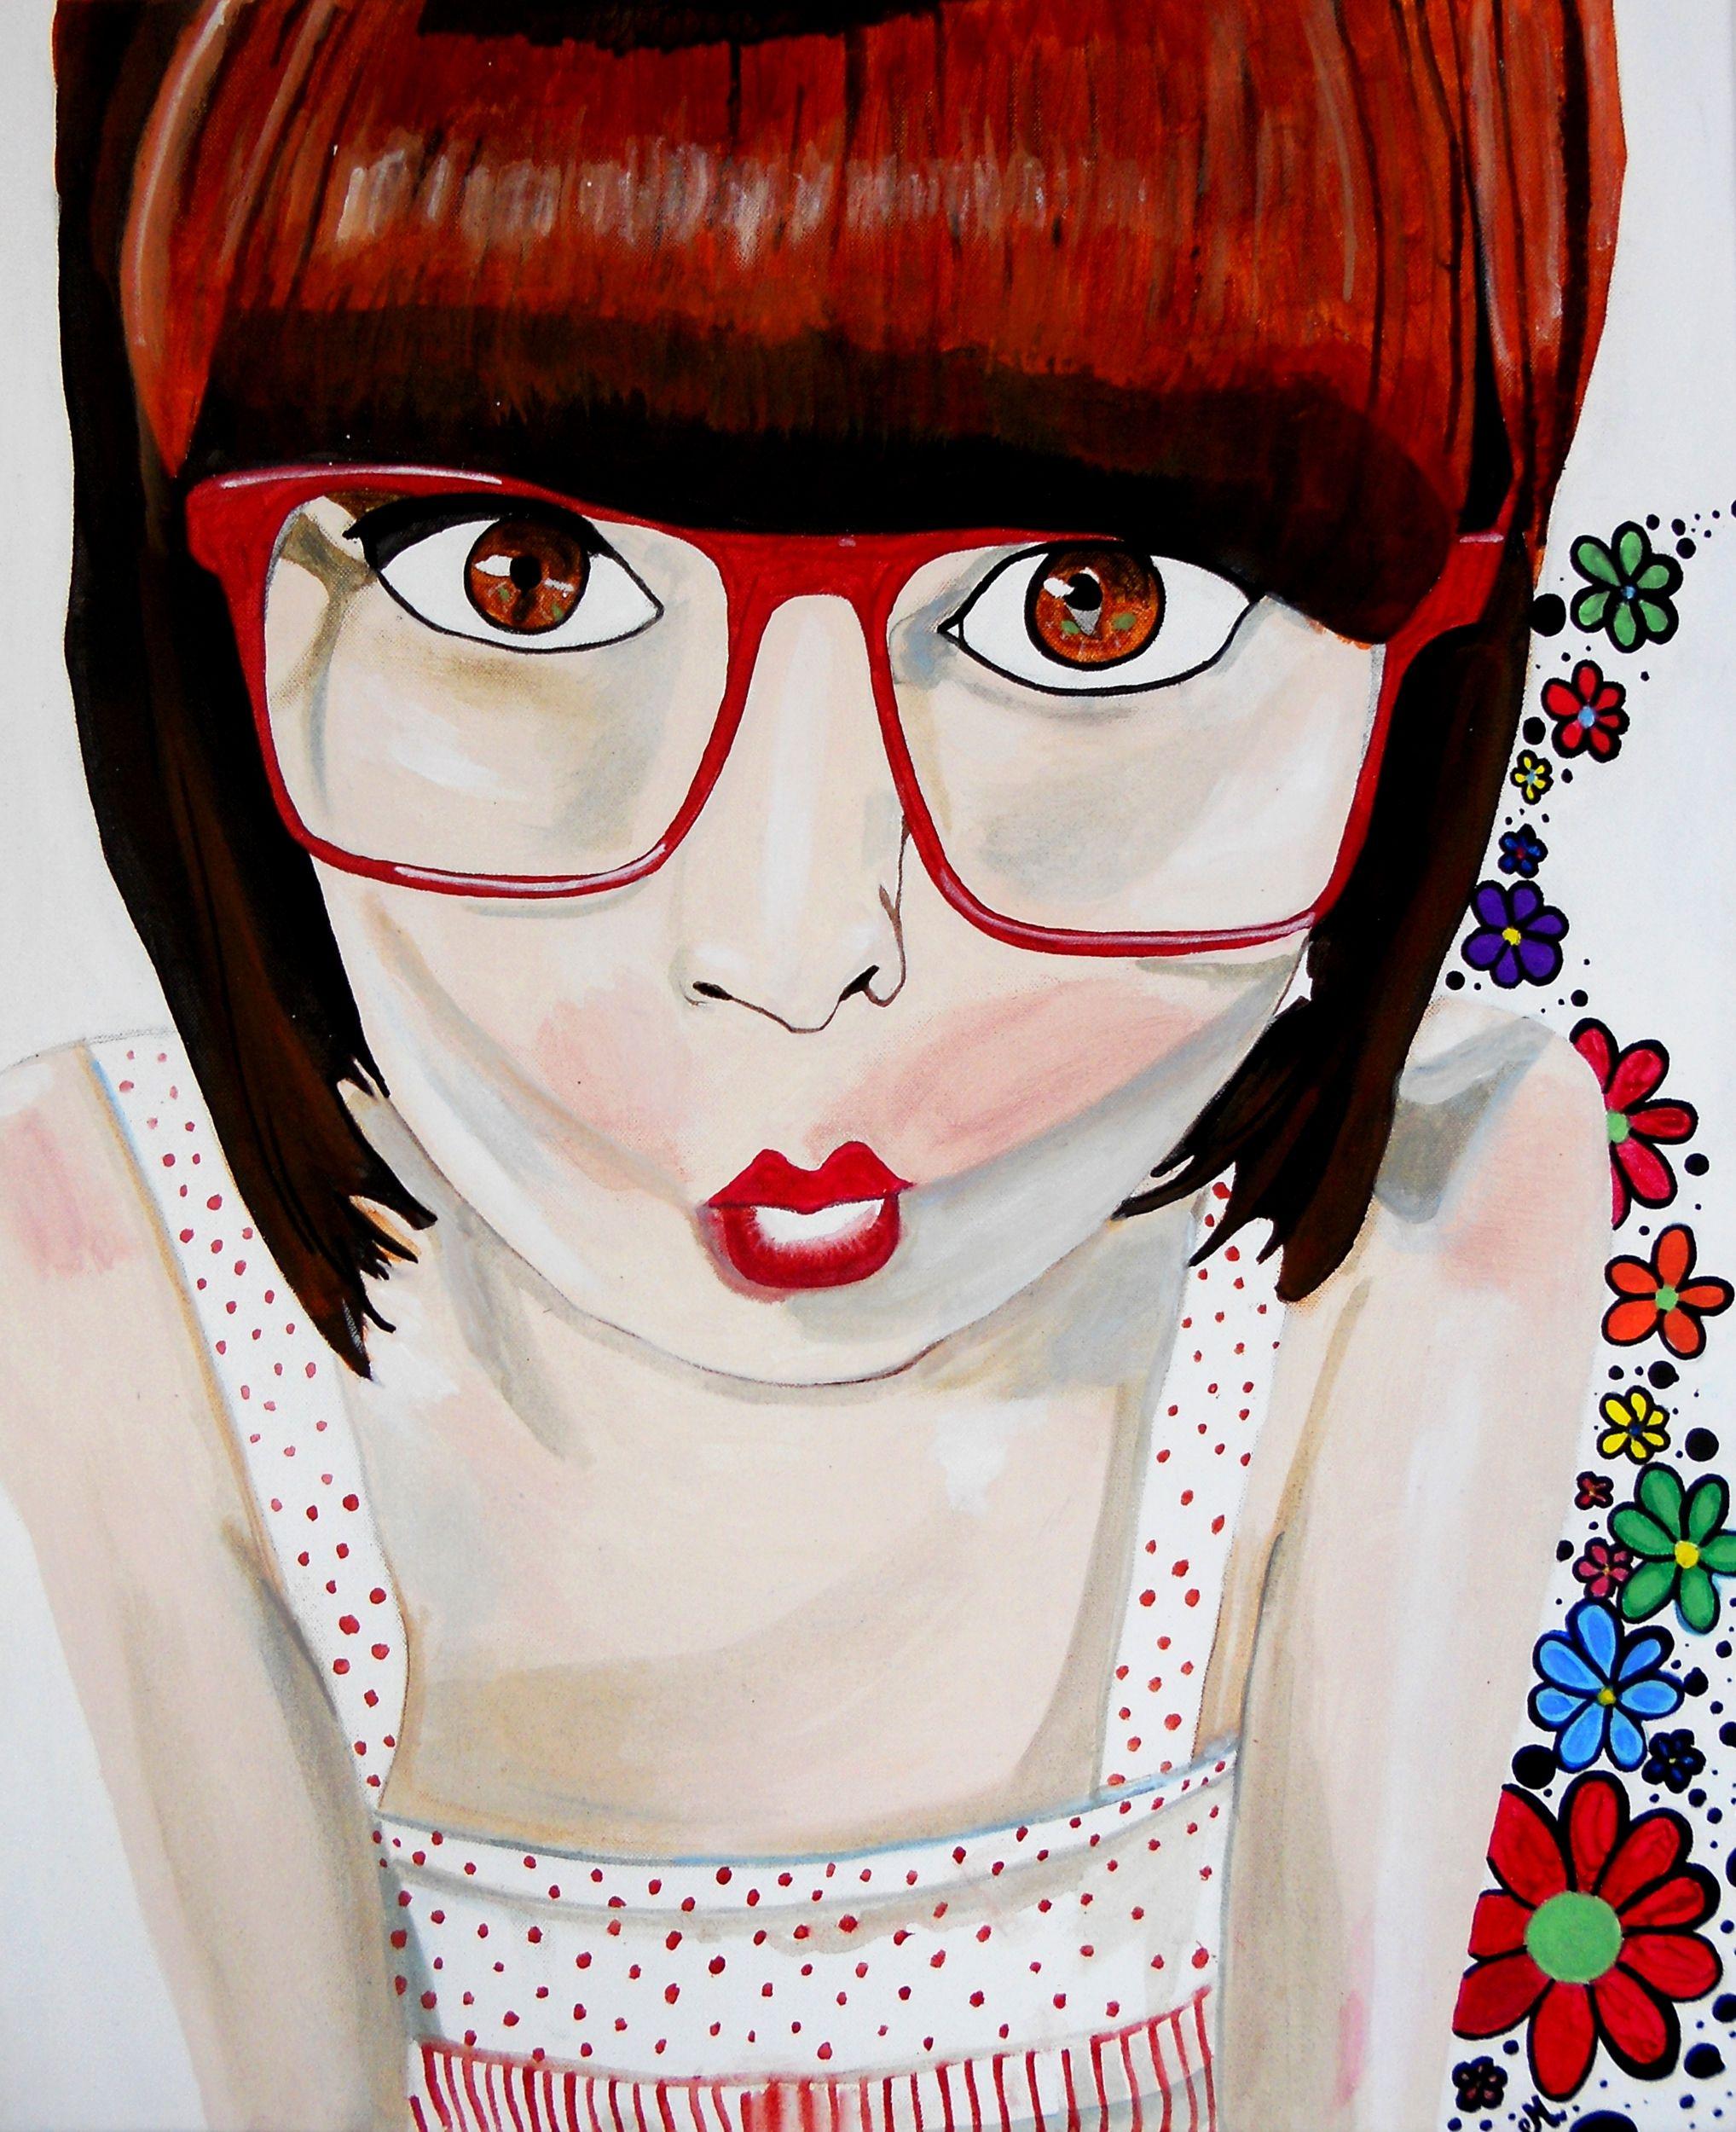 tableau art artiste femme pop manga retro rouge blanc design art tableau pinterest art. Black Bedroom Furniture Sets. Home Design Ideas